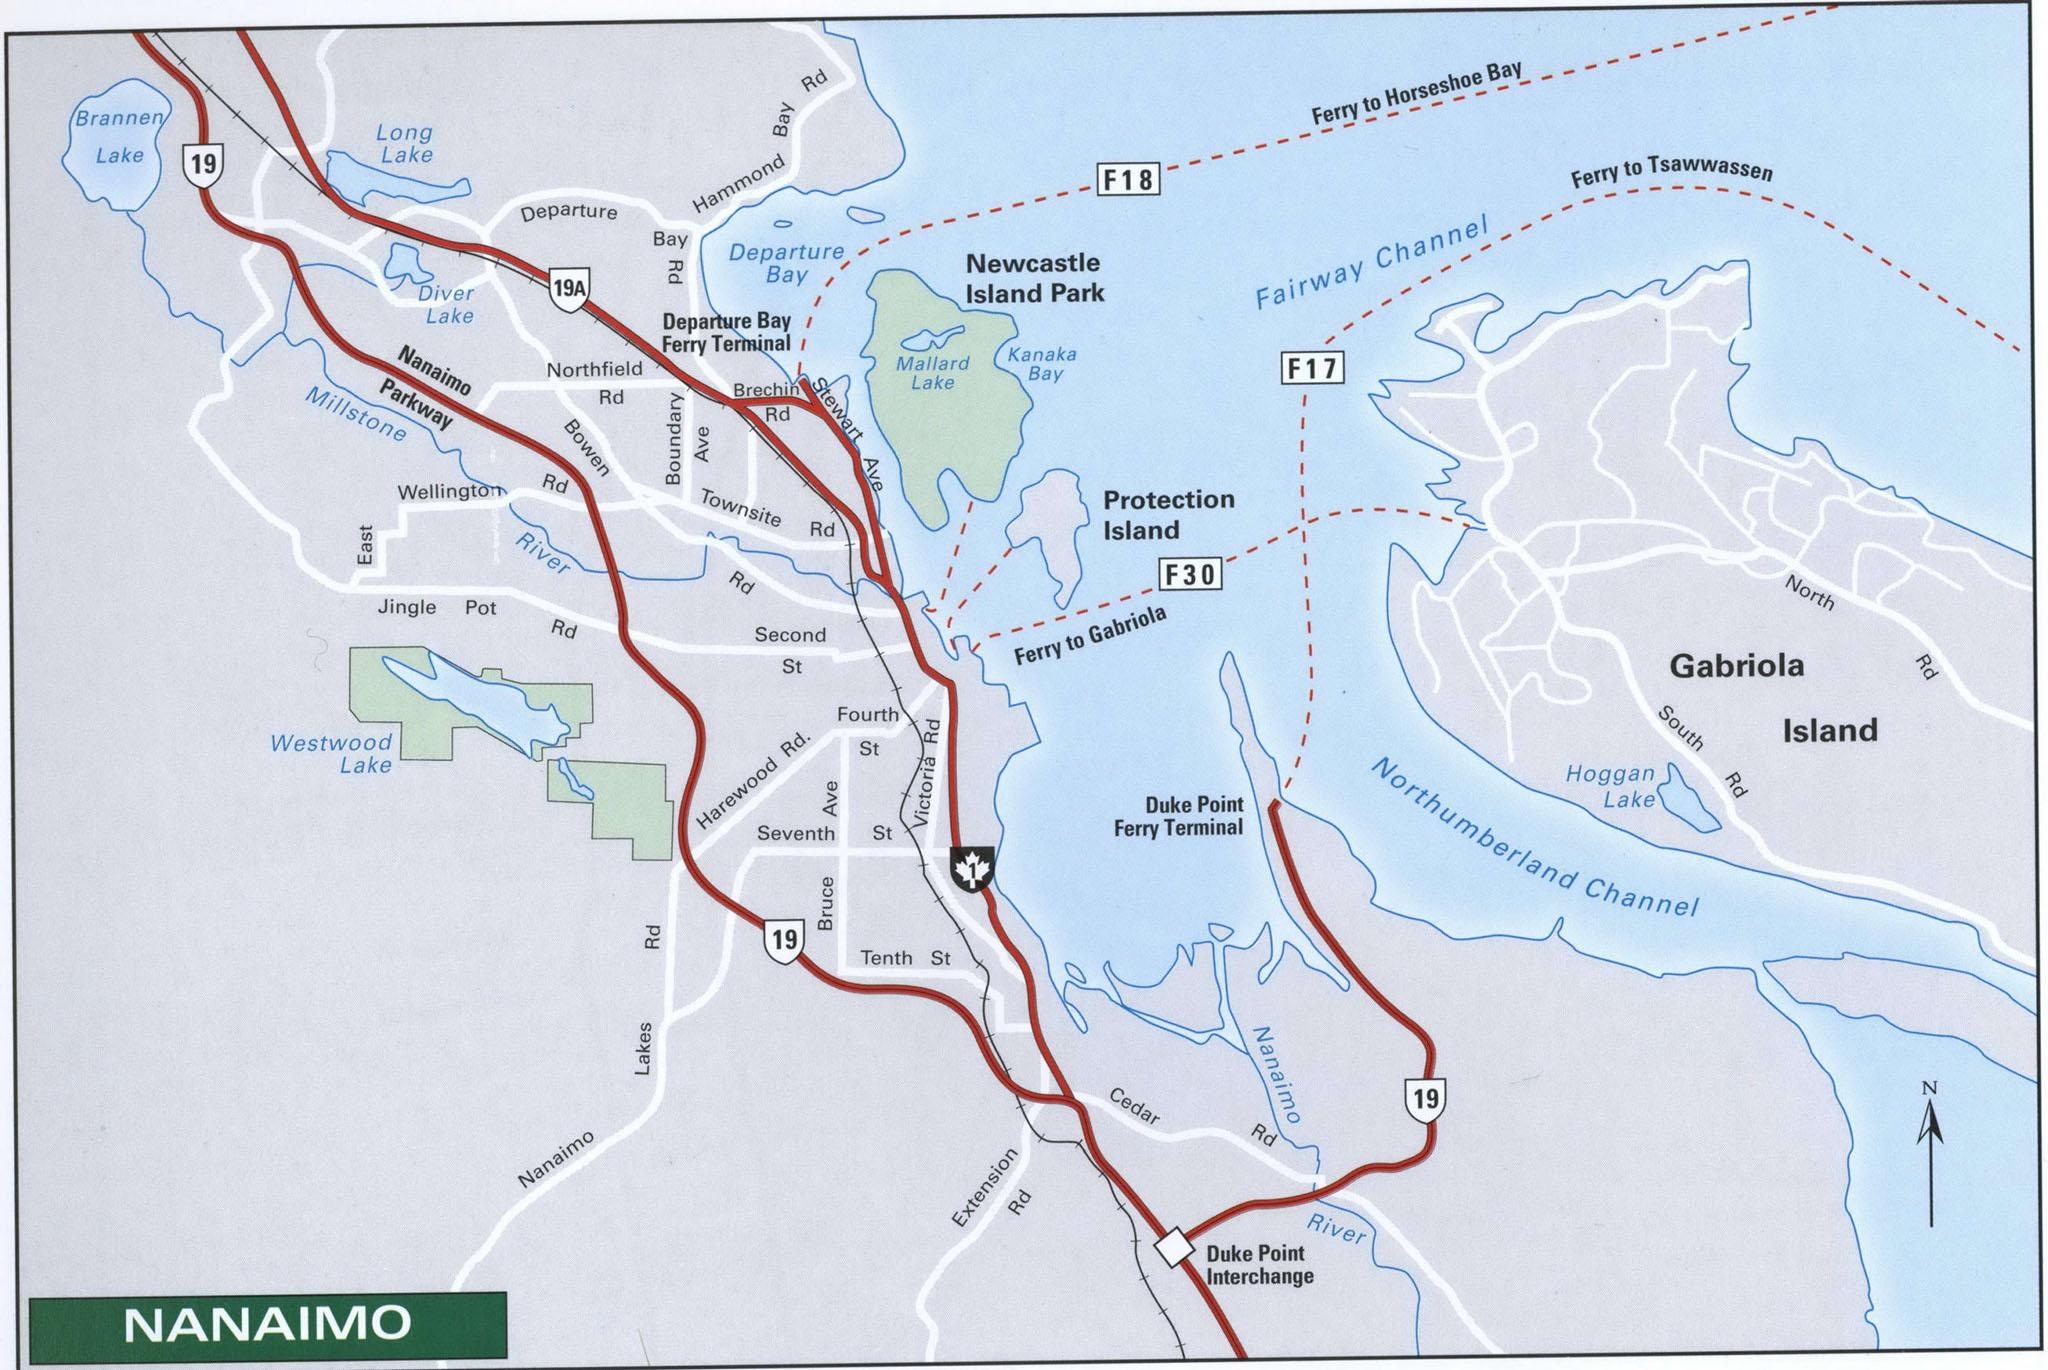 City Of Nanaimo Map City Of Nanaimo Map | compressportnederland City Of Nanaimo Map